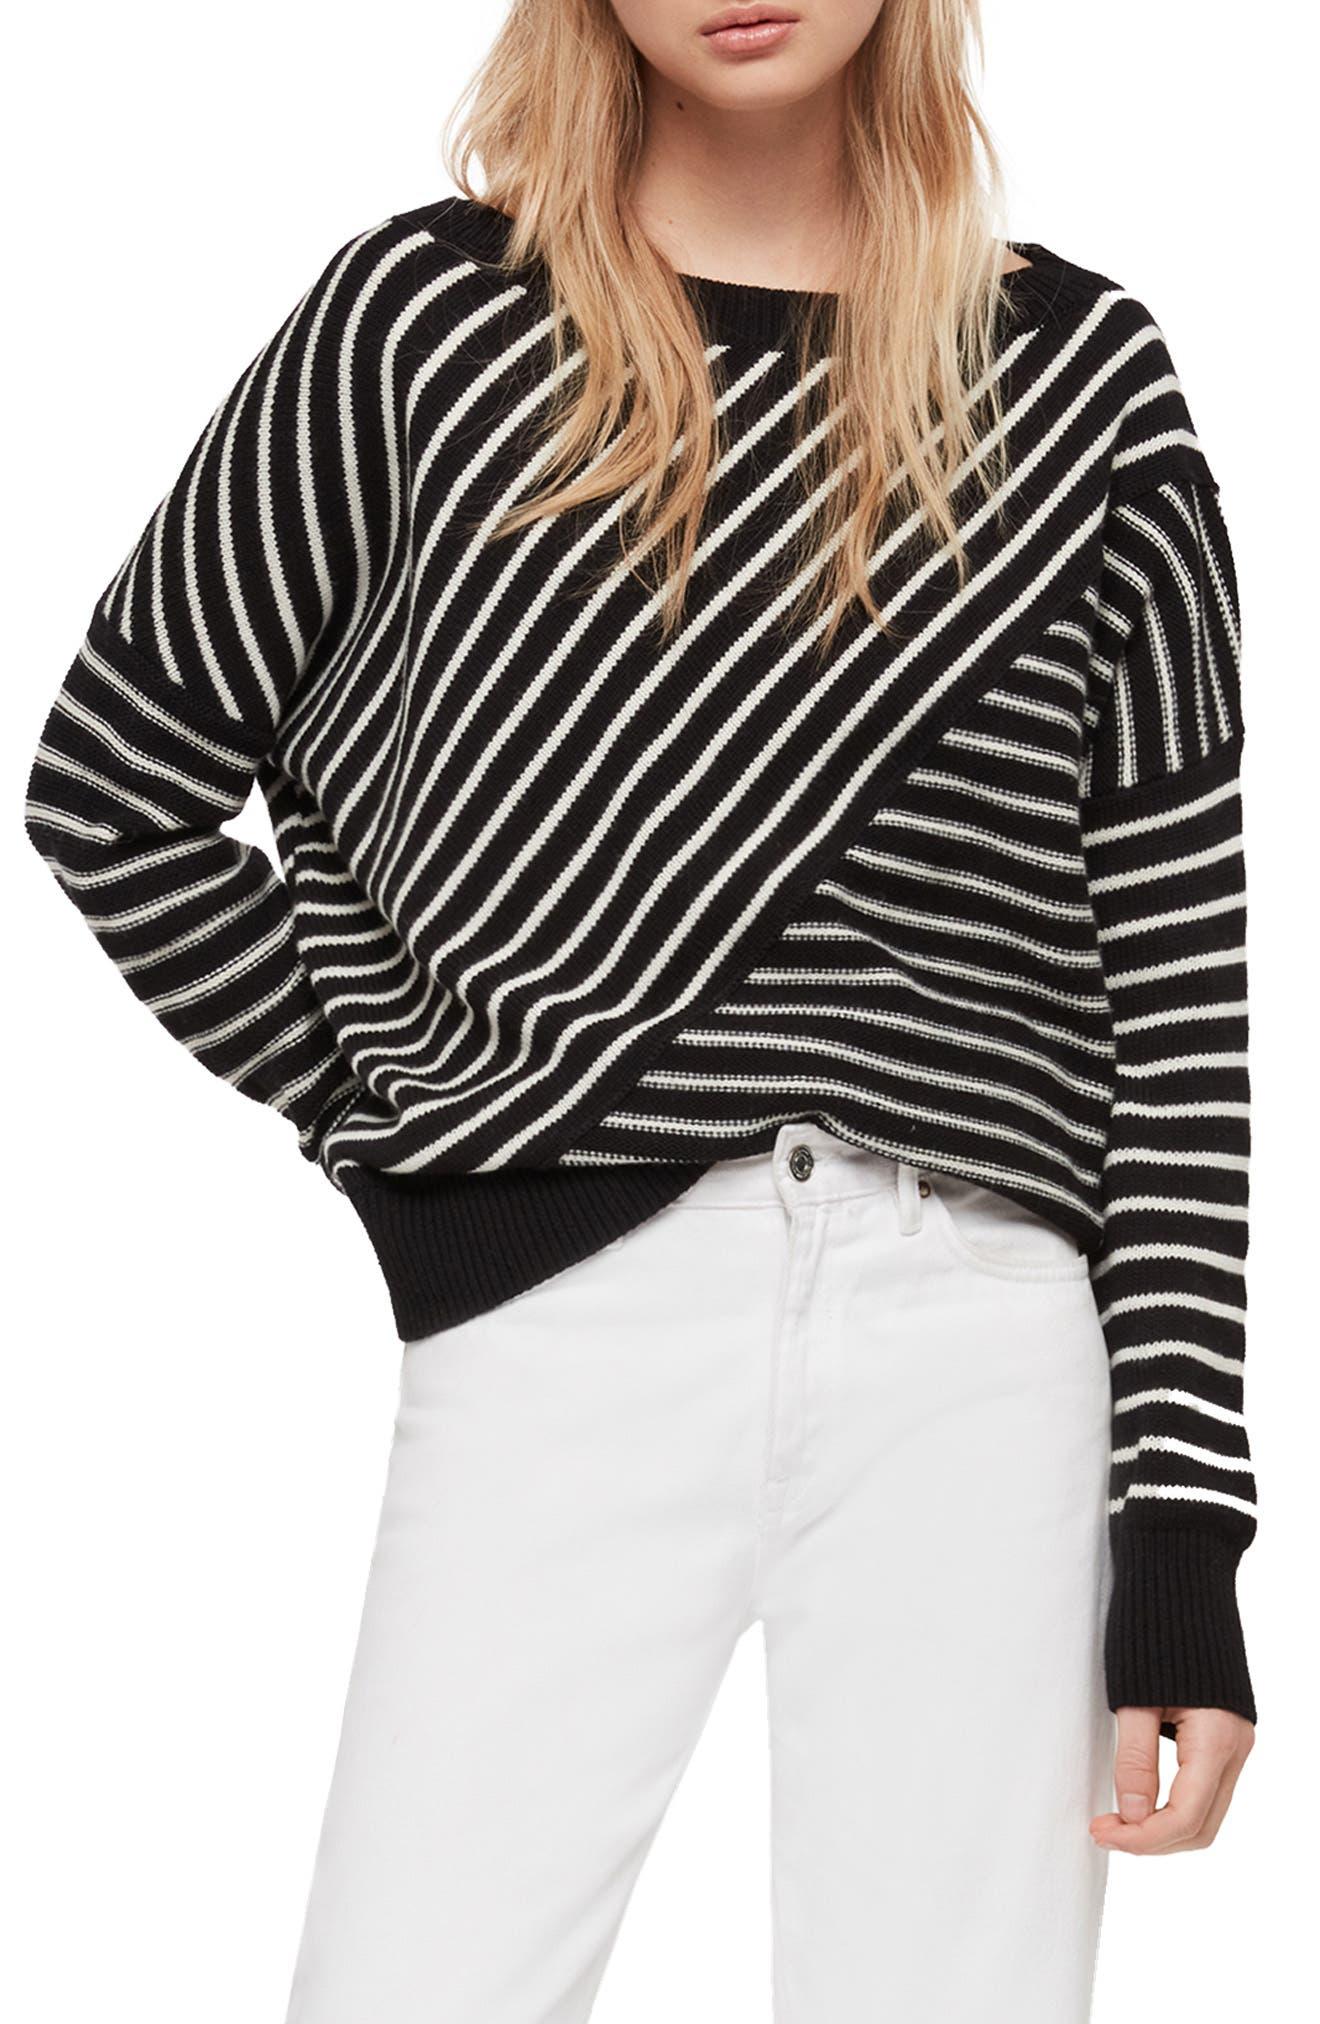 ALLSAINTS Vani Sweater, Main, color, BLACK/ CHALK WHITE